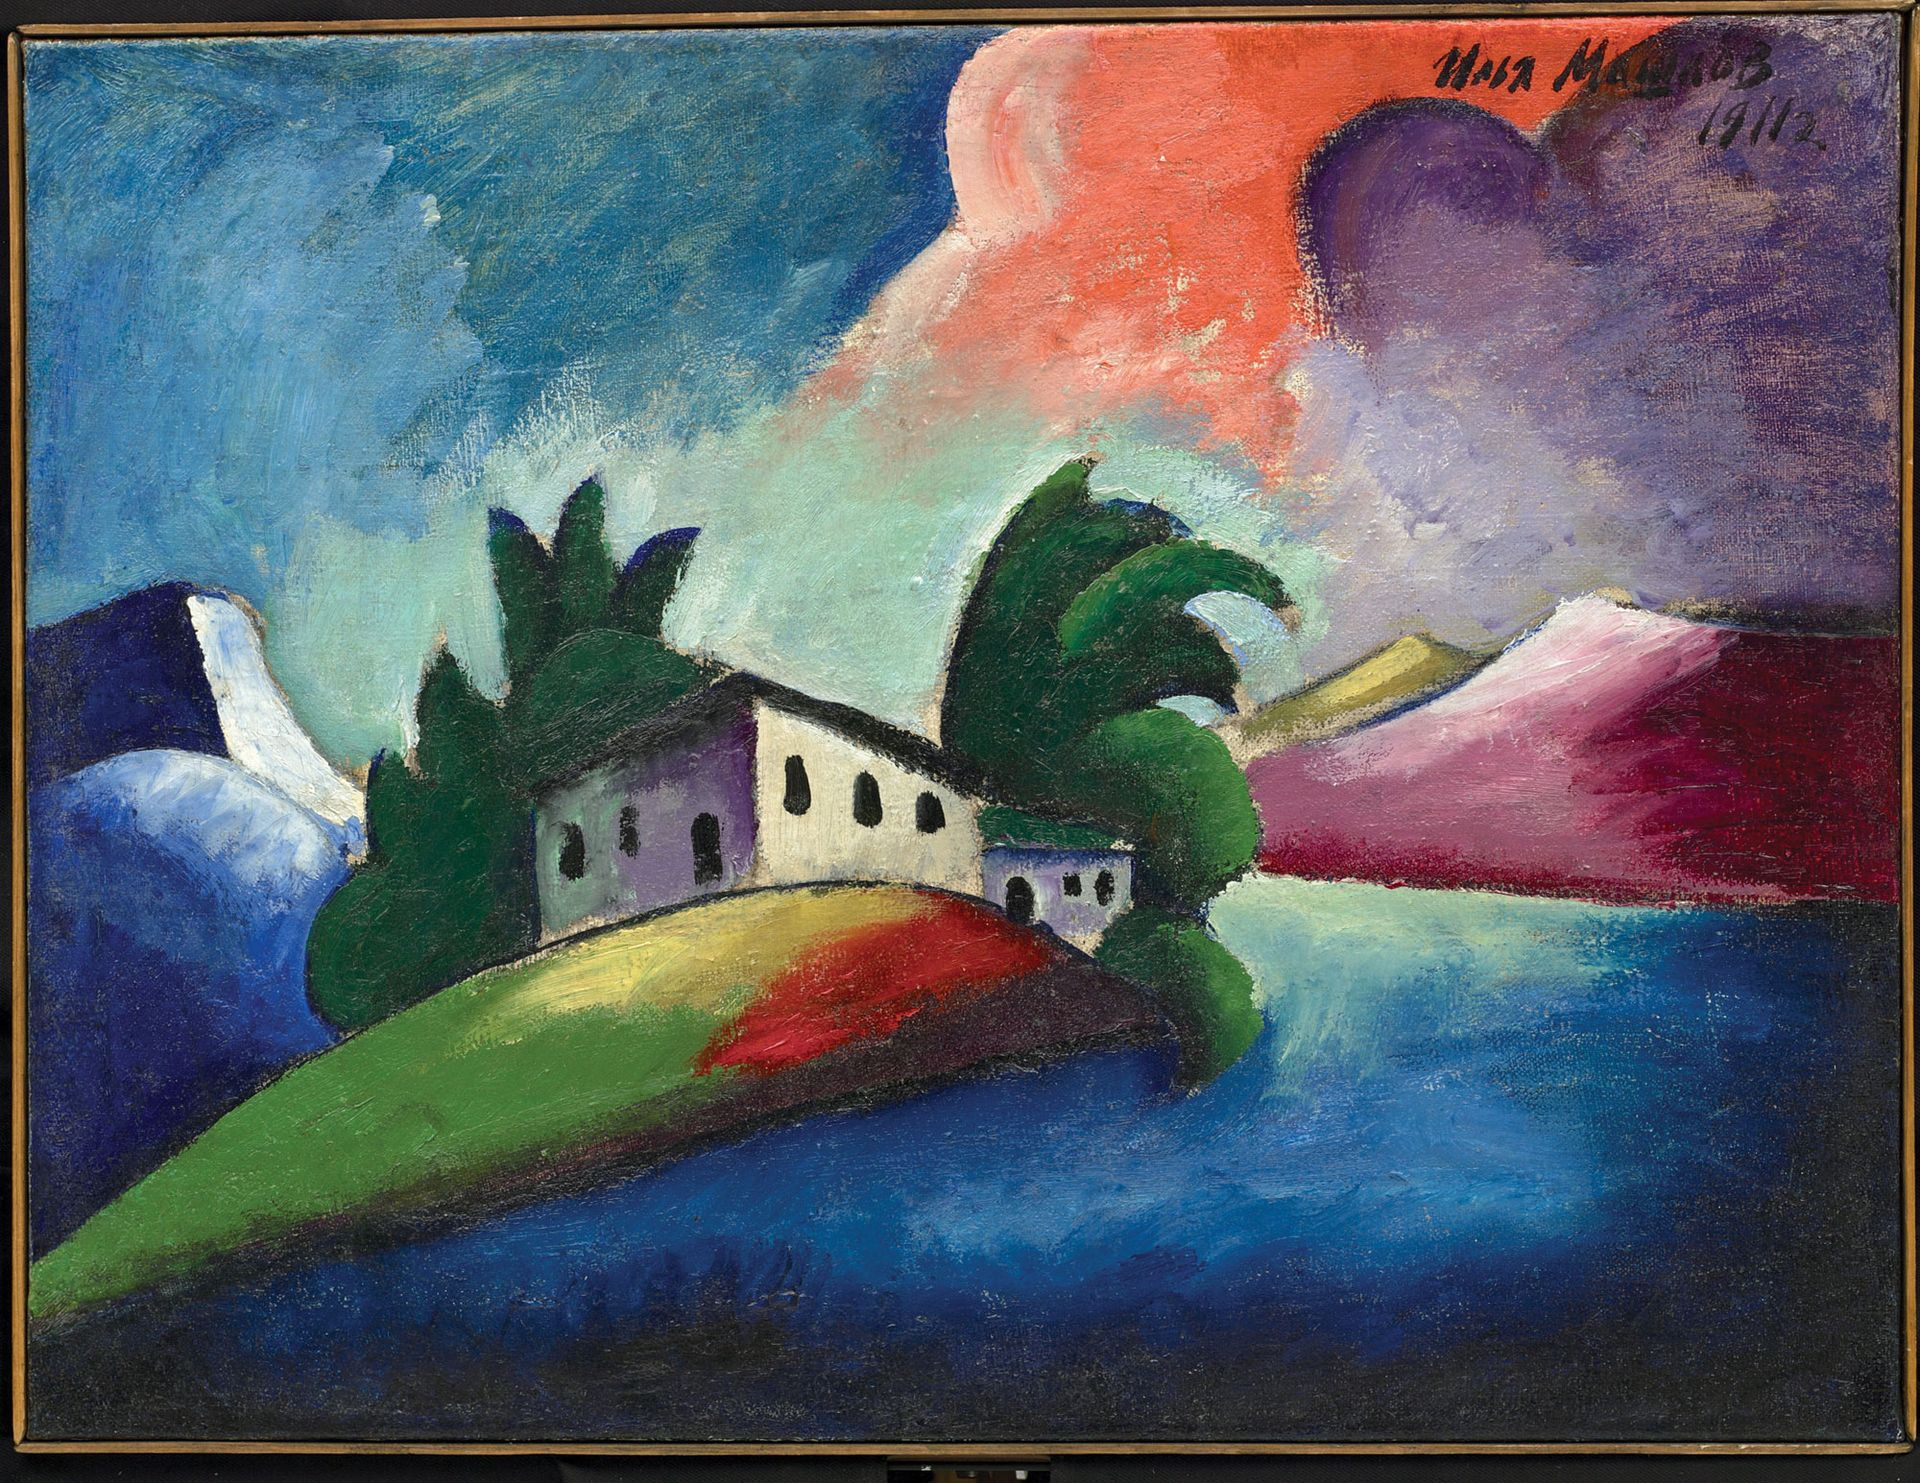 Avant-garde works of art such as Ilya Mashkov's Landscape (1911) were hidden in storage in the Russian regions due to Soviet censorship © Vasnetsov Brothers Art Museum